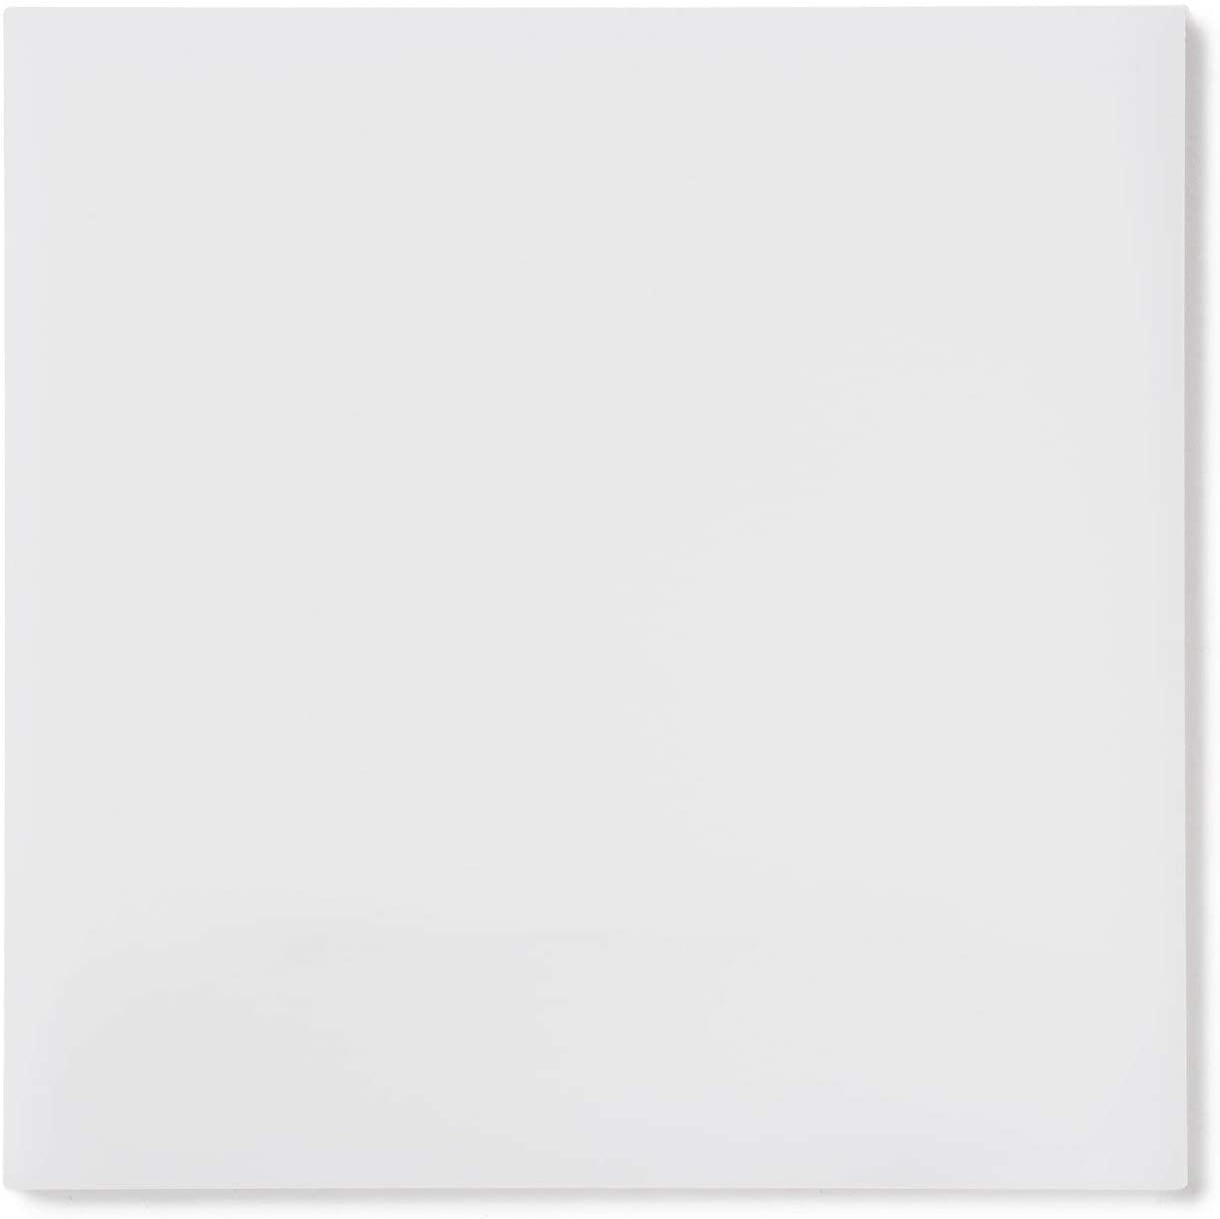 "Rock Hard Plastics - 12"" x 12"" White Acrylic Sheet Lucite Plexiglass - (Actual Size 11.875"" x 11.875"" - .118"" (1/8"")"